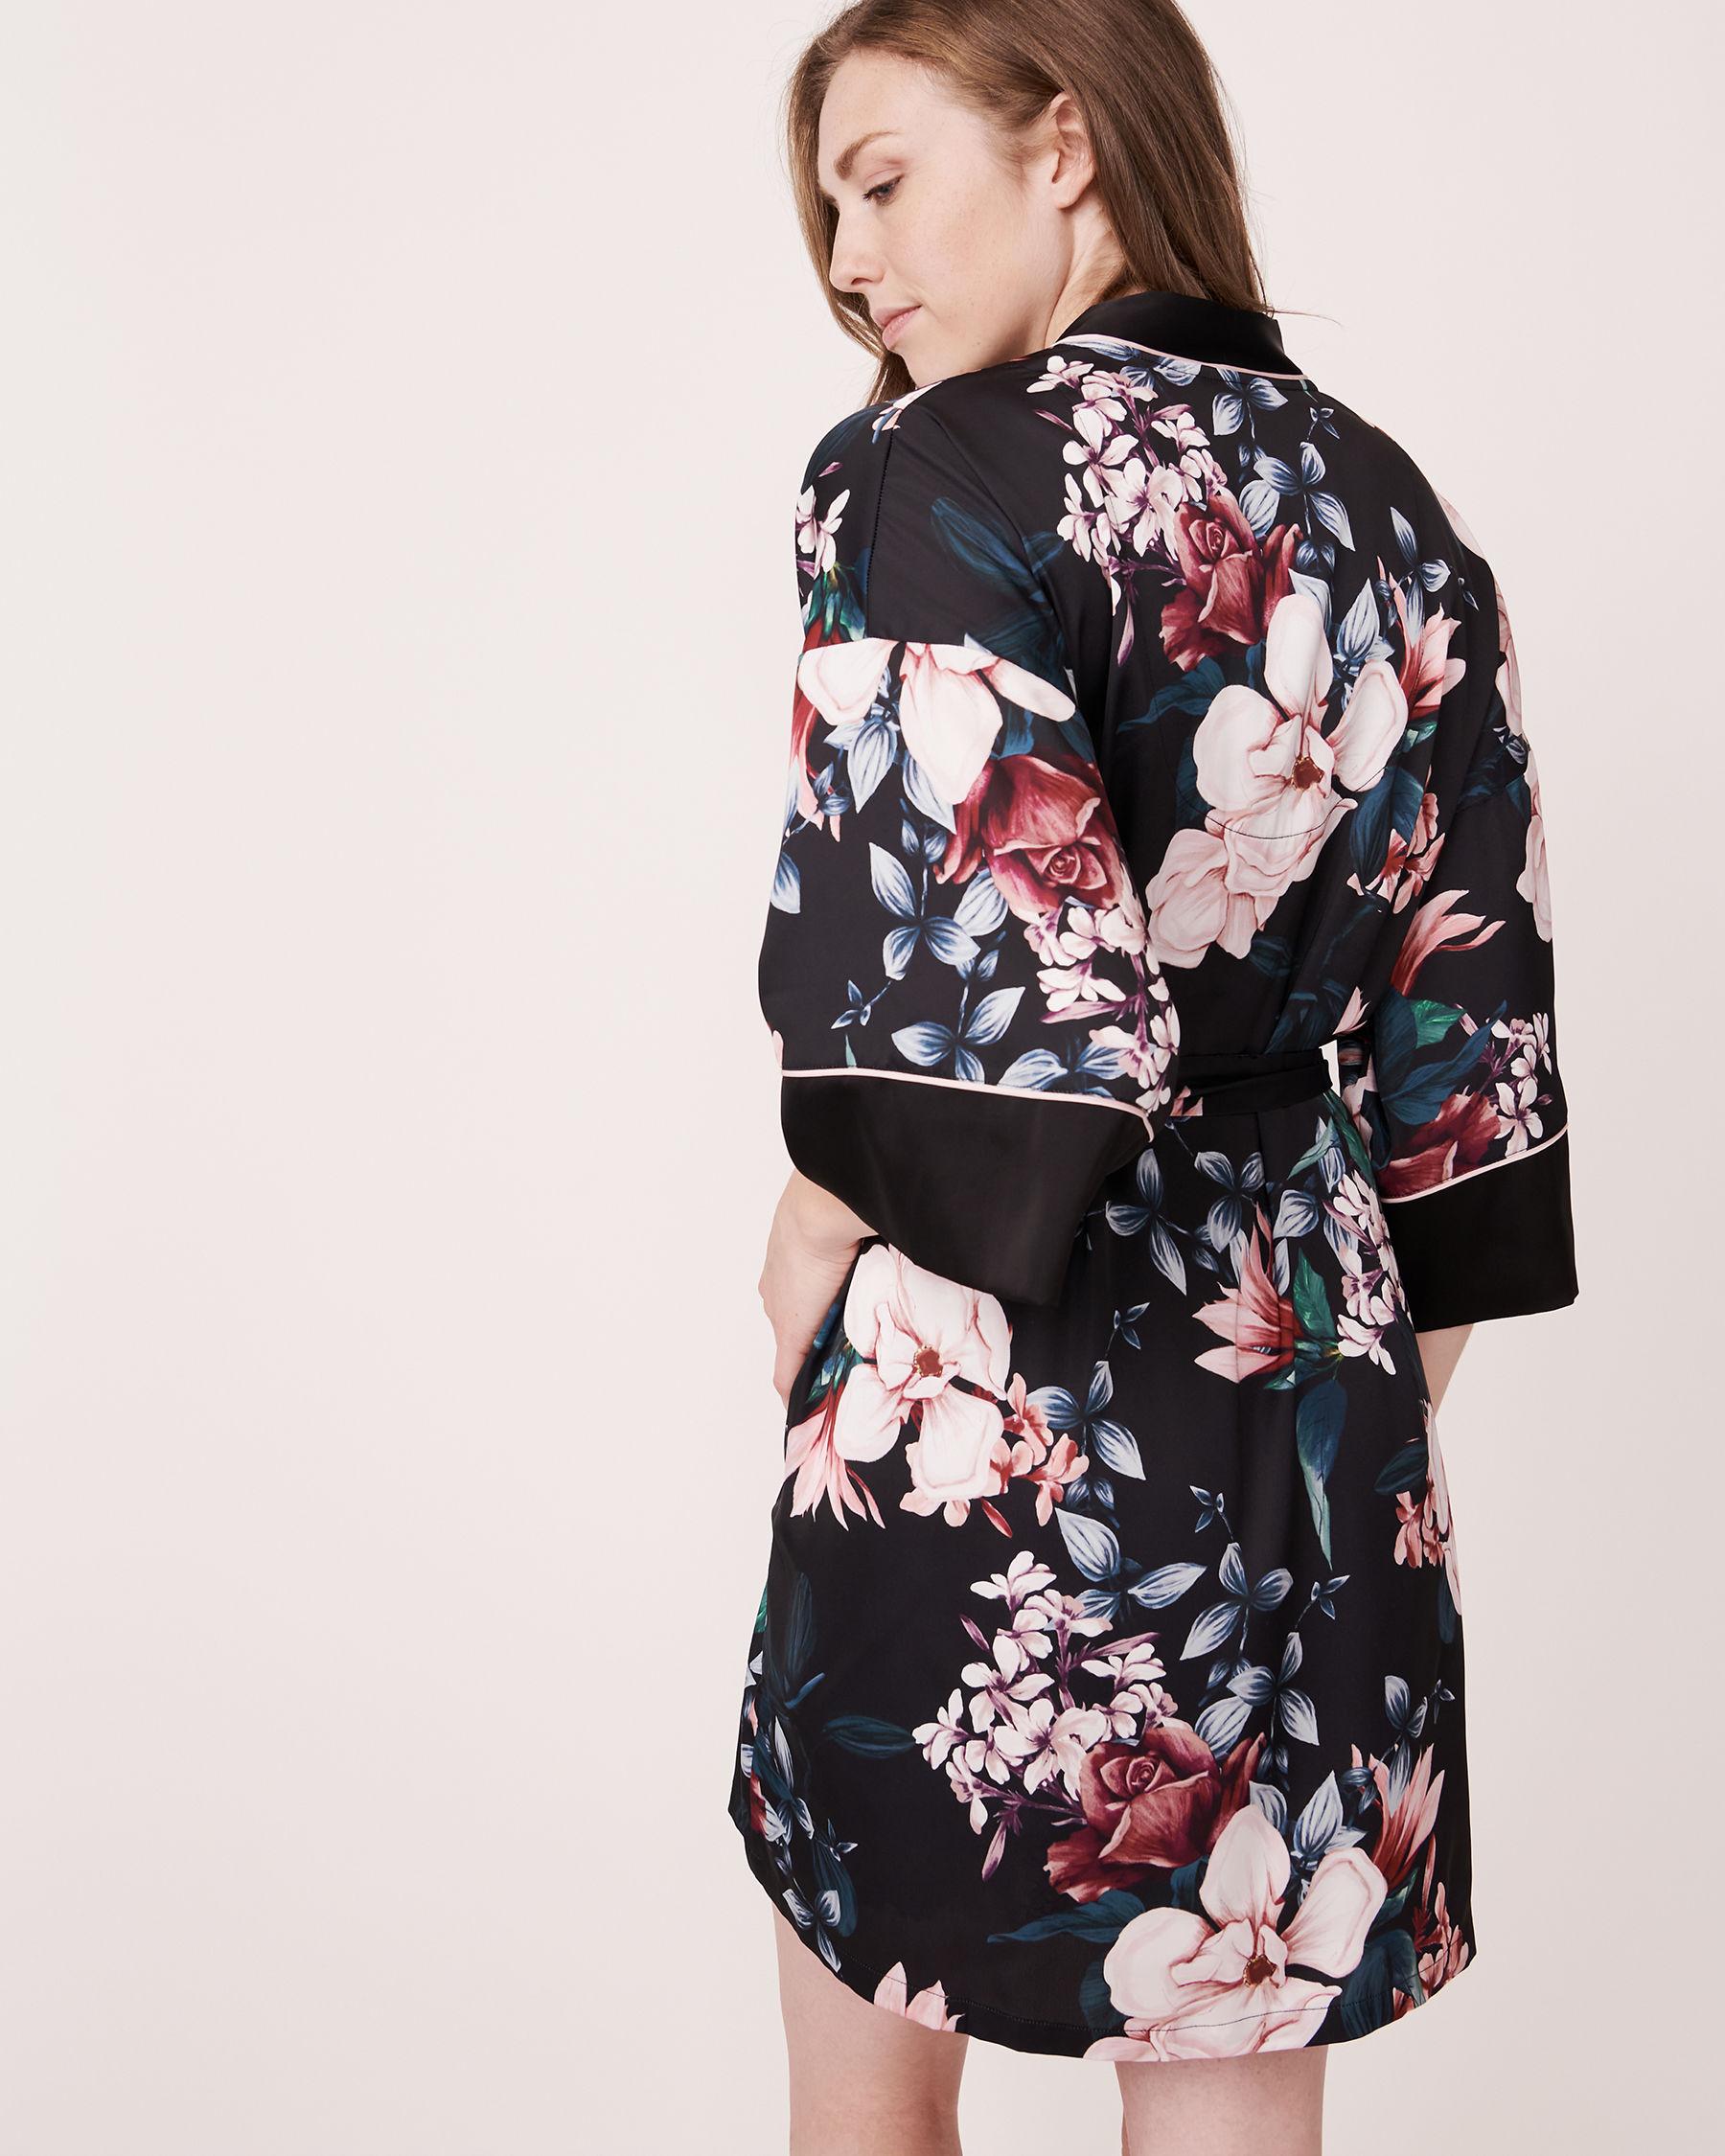 LA VIE EN ROSE Kimono en satin mat Noir 870-435-0-11 - Voir7